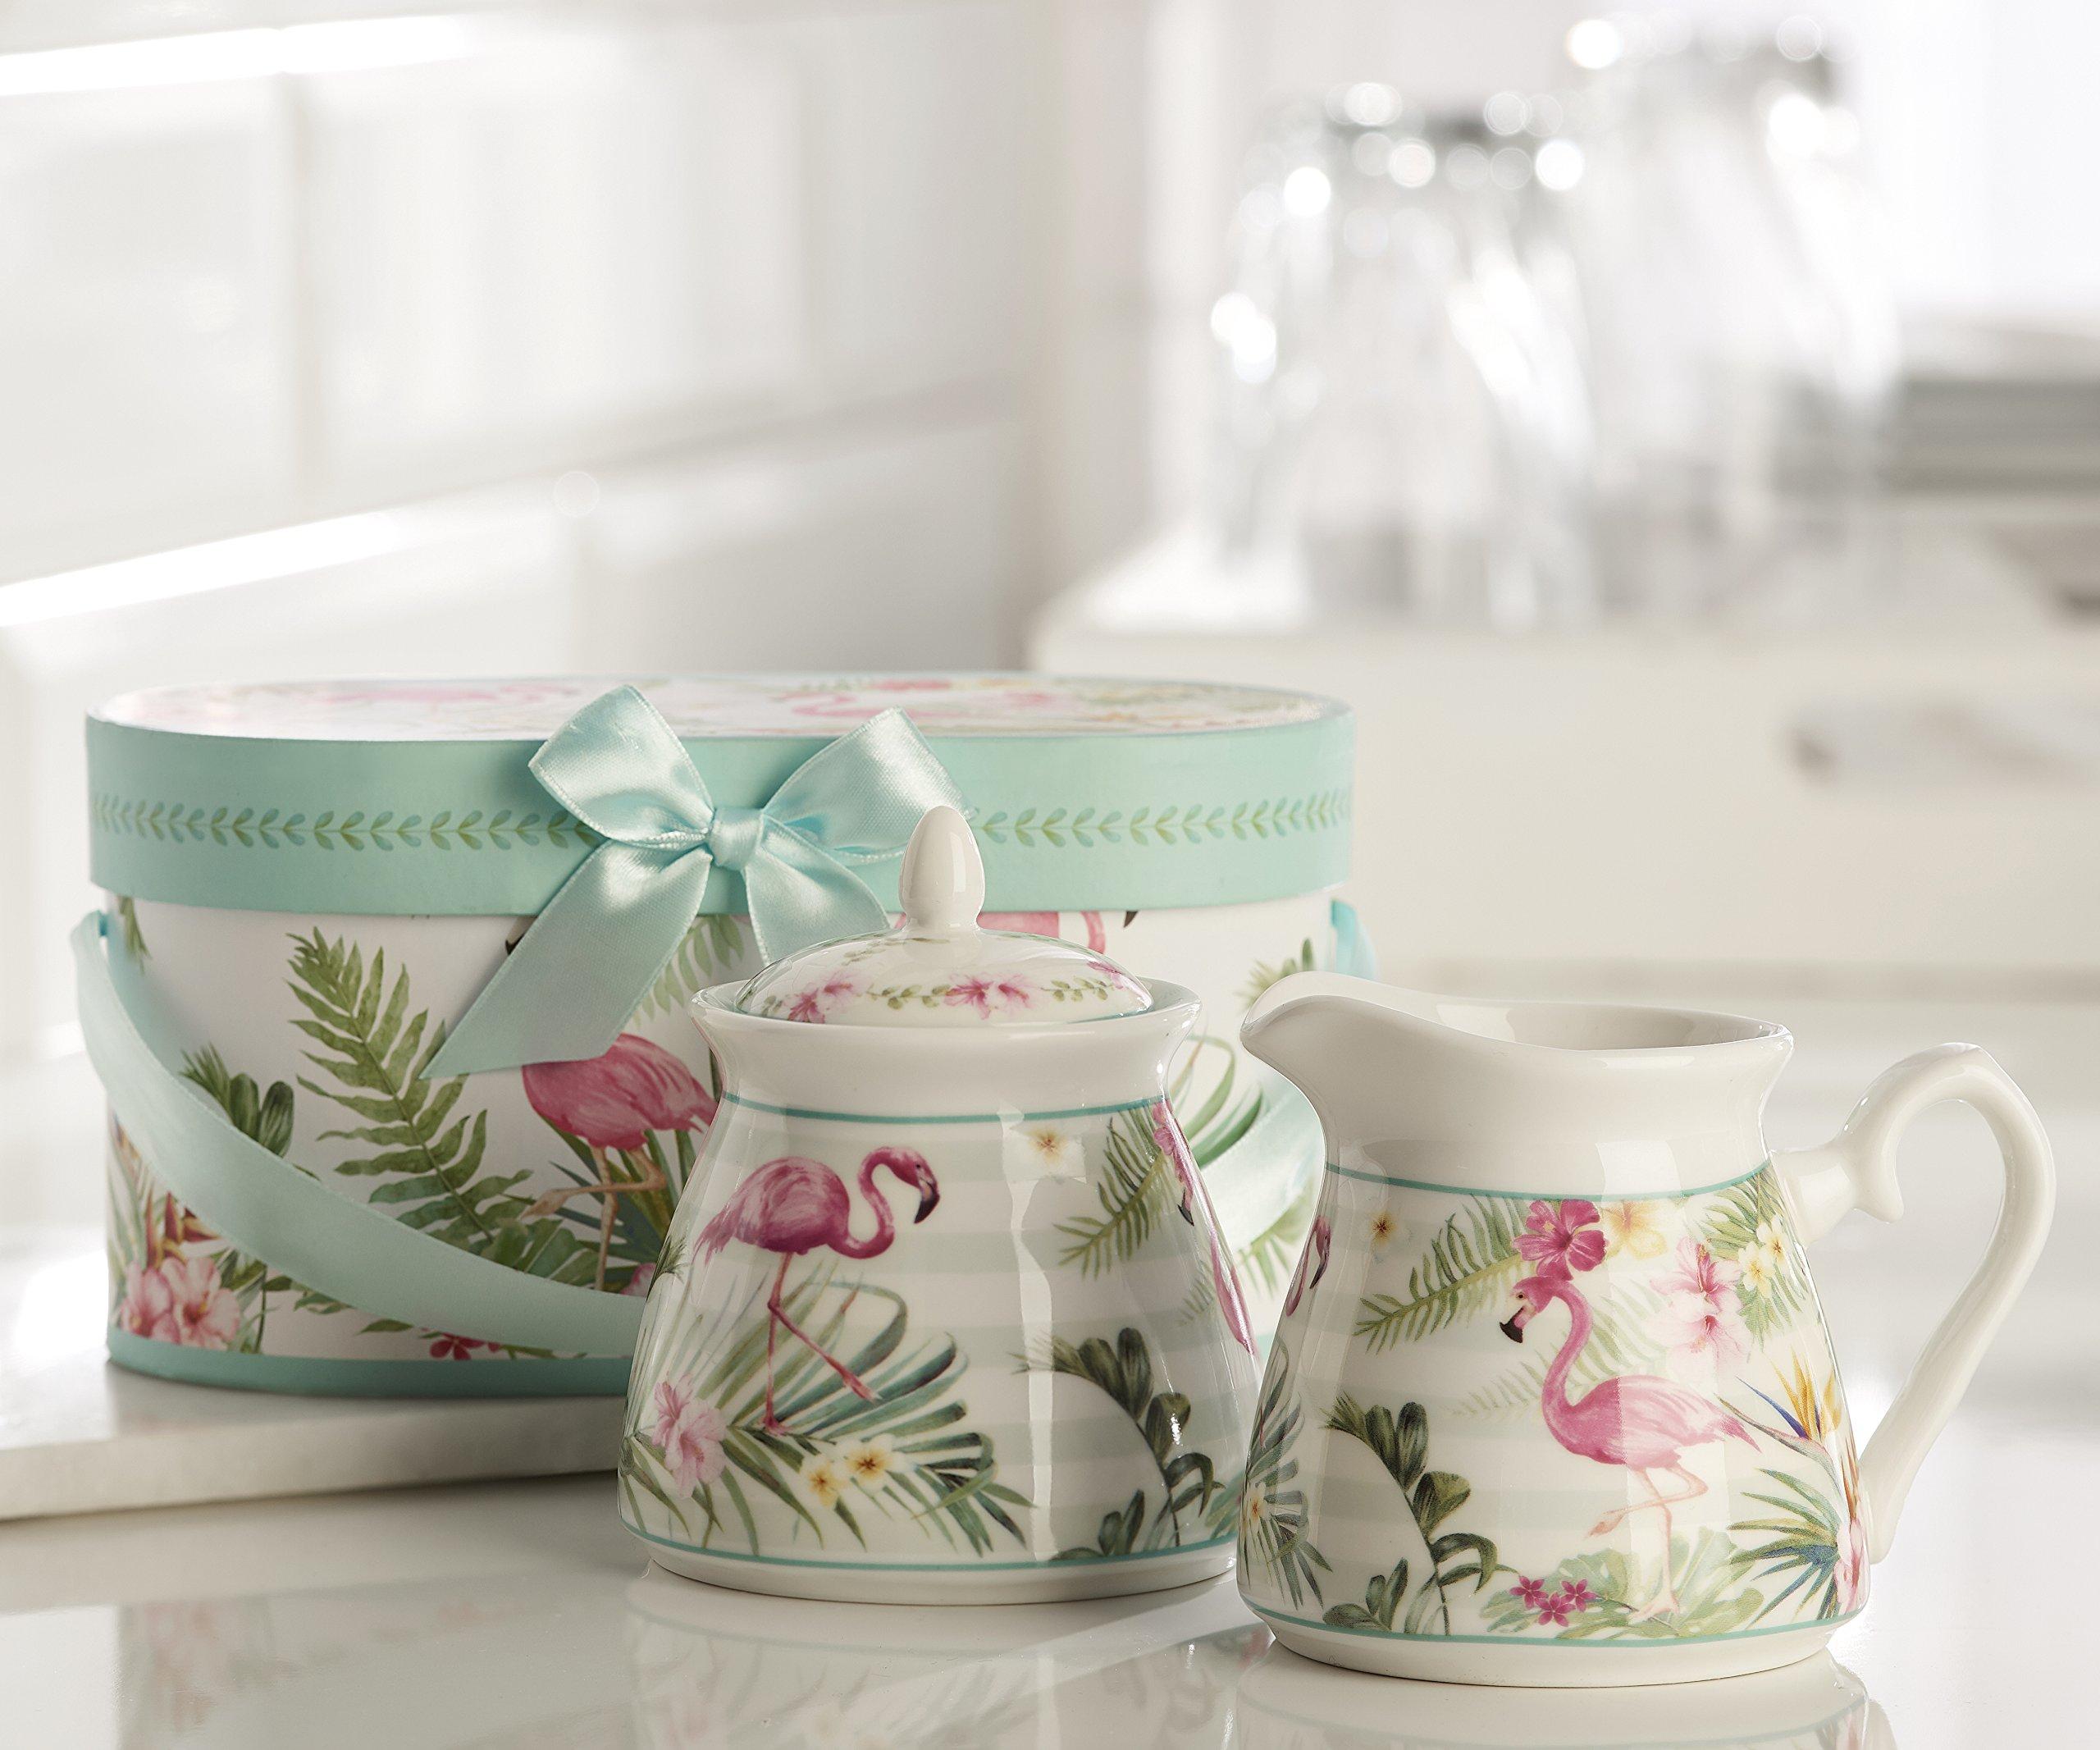 Giftcraft Flamingo Design Cream and Sugar Set in Gift Box